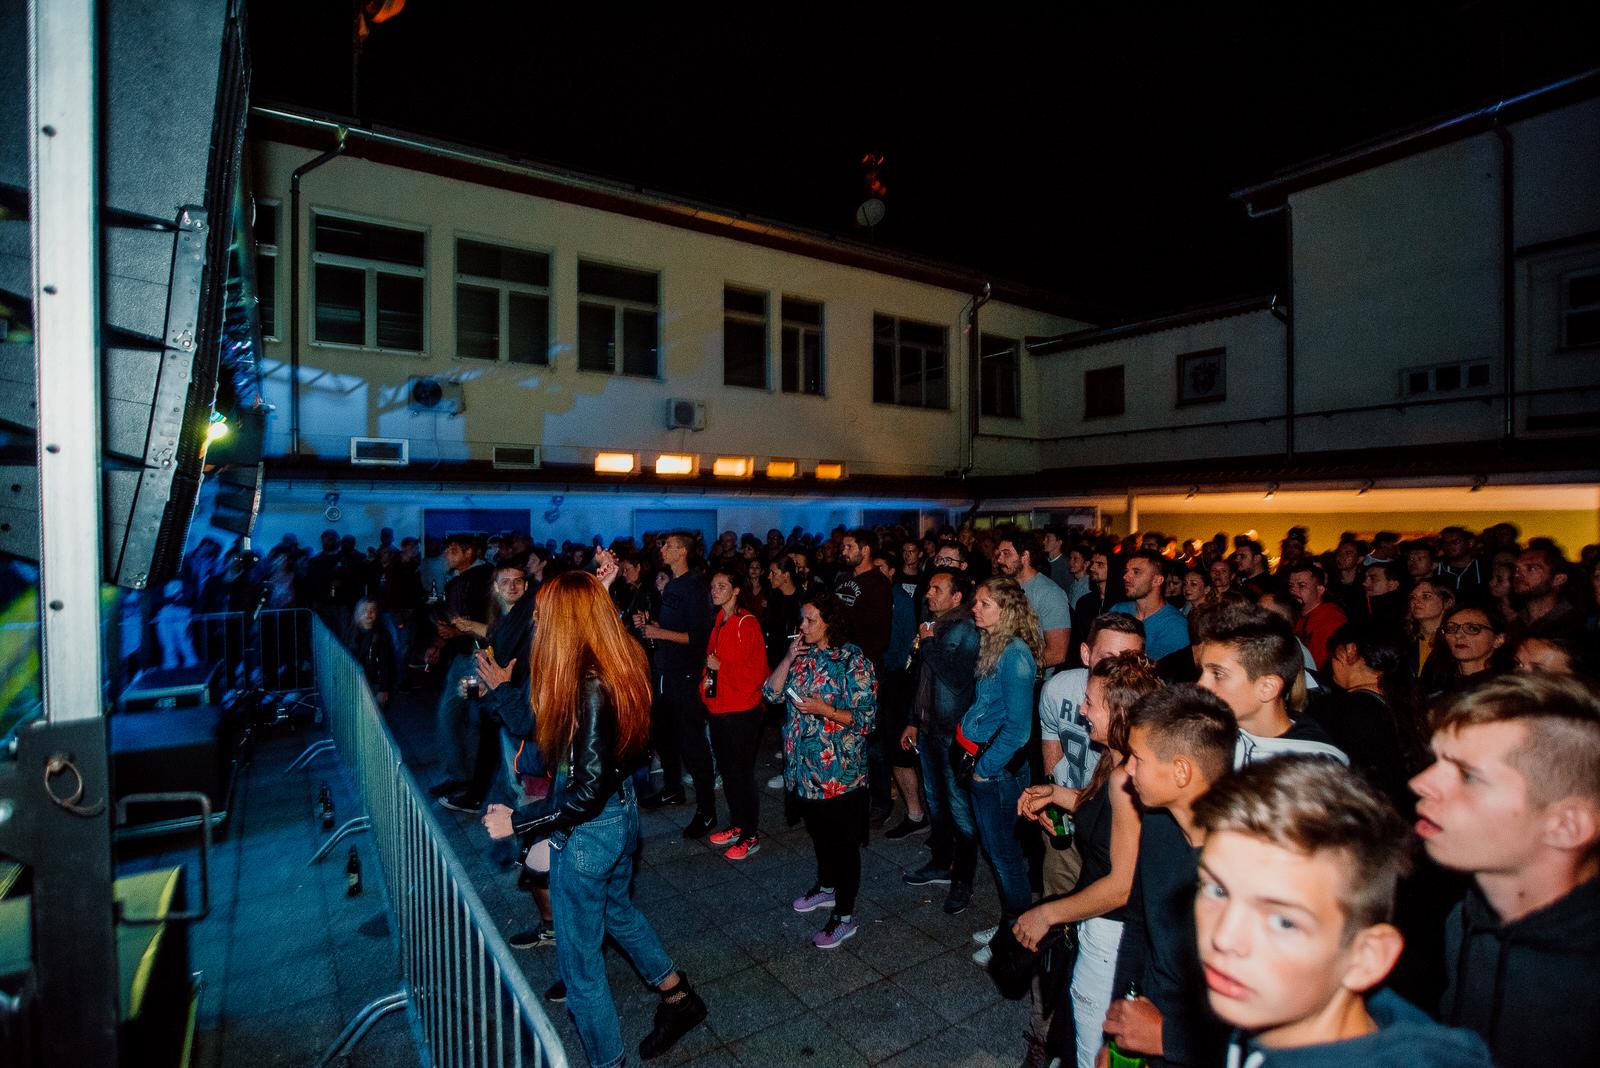 likaclub_grocks-2019_tbf-barbara-munjas-16